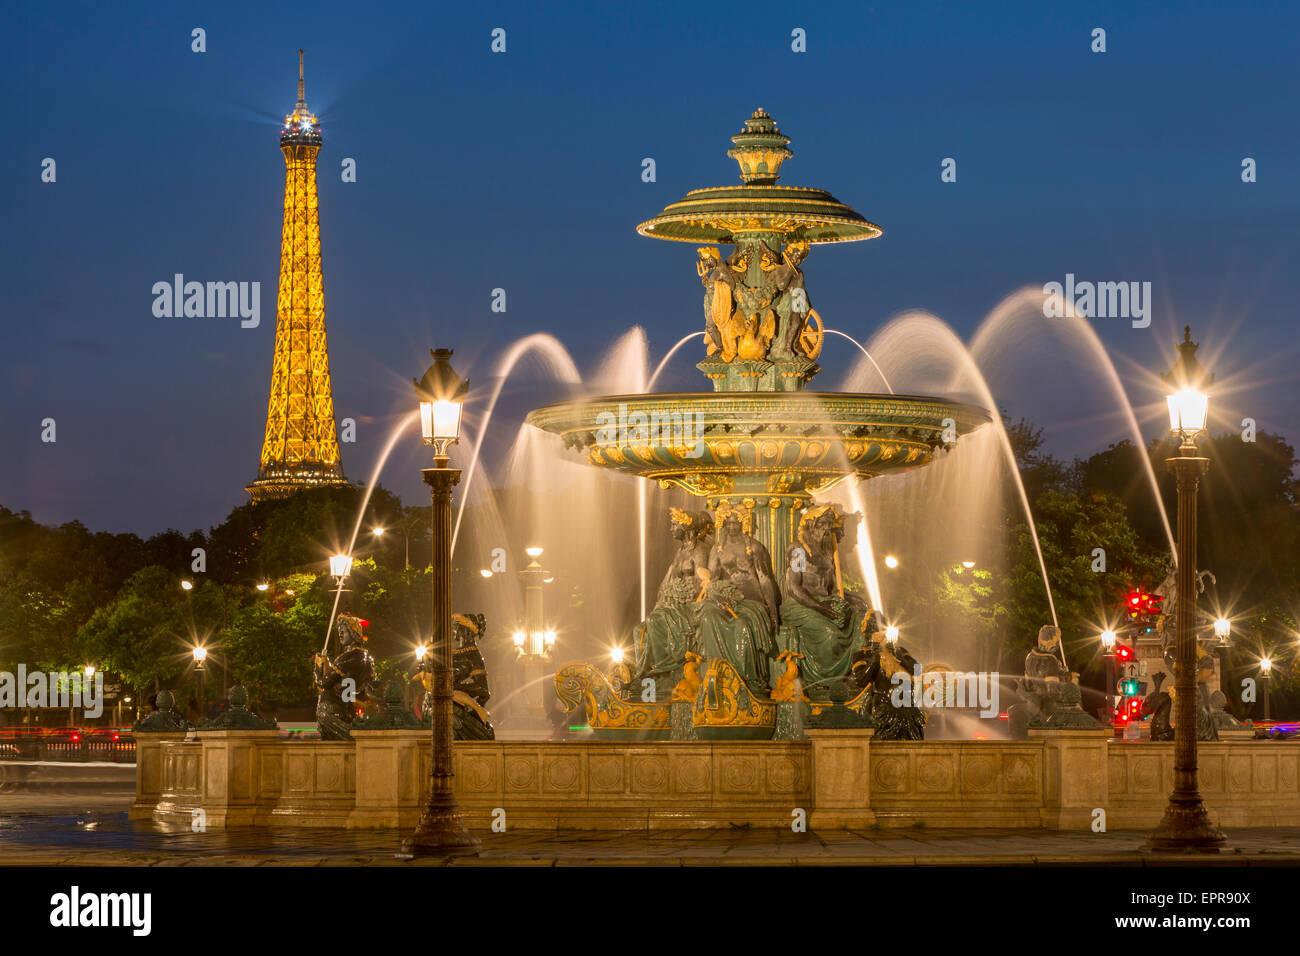 Fontaine des Fleuves - Fountain of Rivers at Place de la Concorde with the Eiffel Tower beyond, Paris France - Stock Image